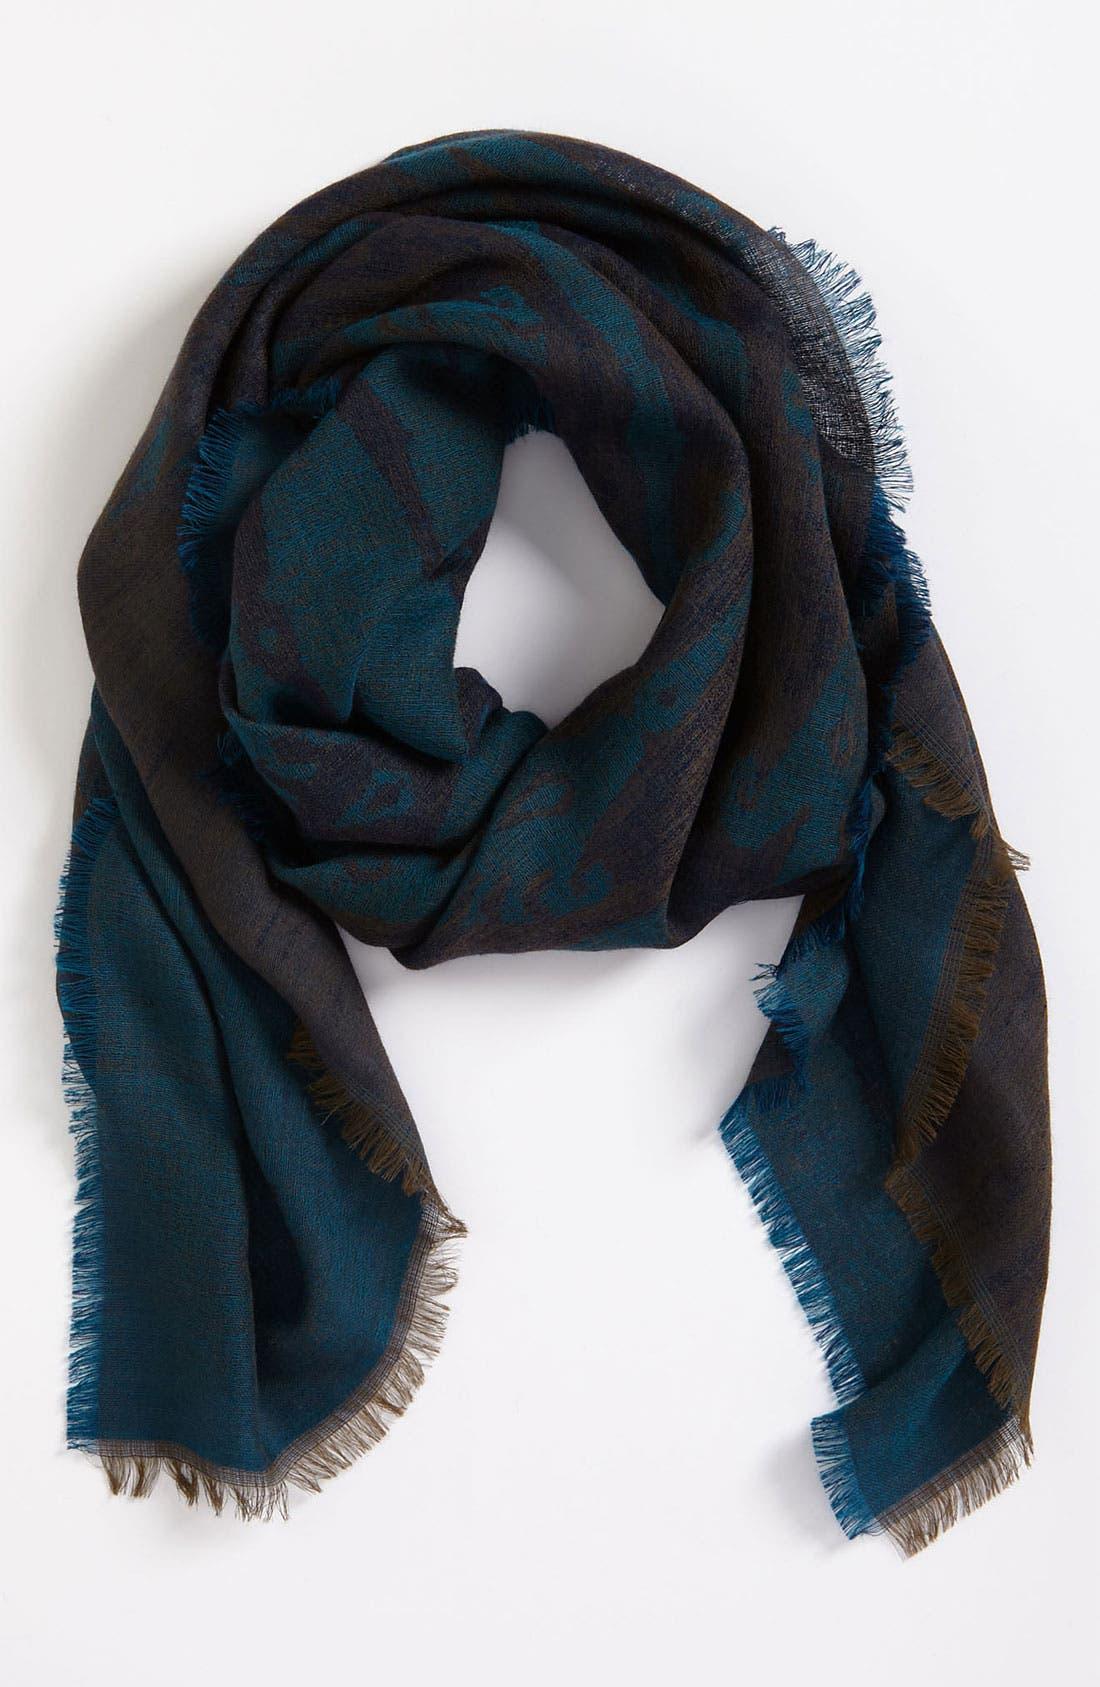 Alternate Image 1 Selected - Etro Jacquard Wool Scarf